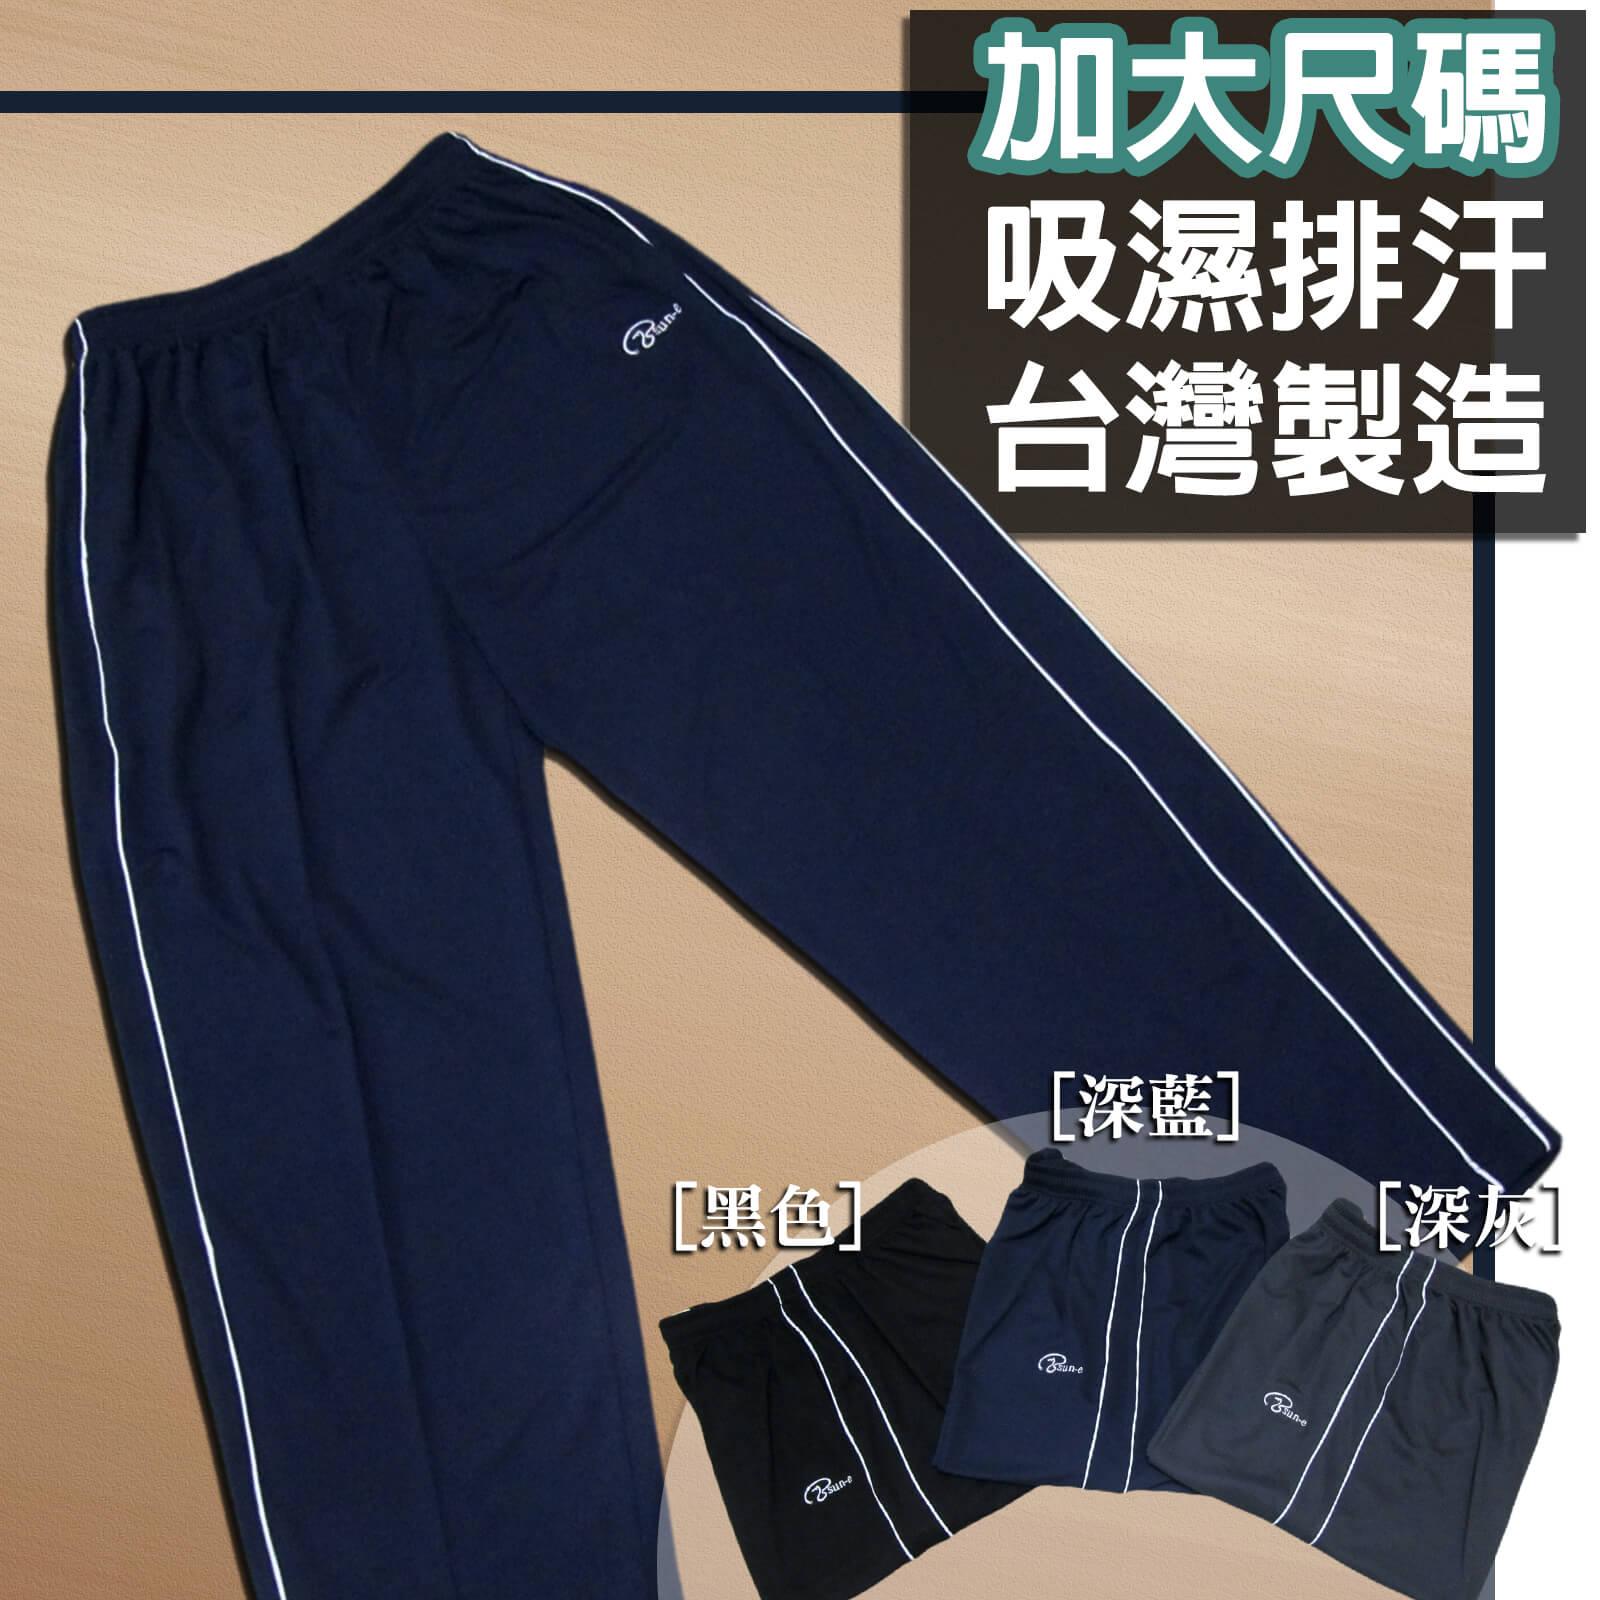 sun-e加大尺碼吸濕排汗運動長褲台灣製造MIT褲腳無縮口、褲腳無束口、經典雙線條滾邊裝飾(310-7336-08)深藍(22)深灰(21)黑 腰圍:3L(36~50英吋)、5L(40~60英吋)